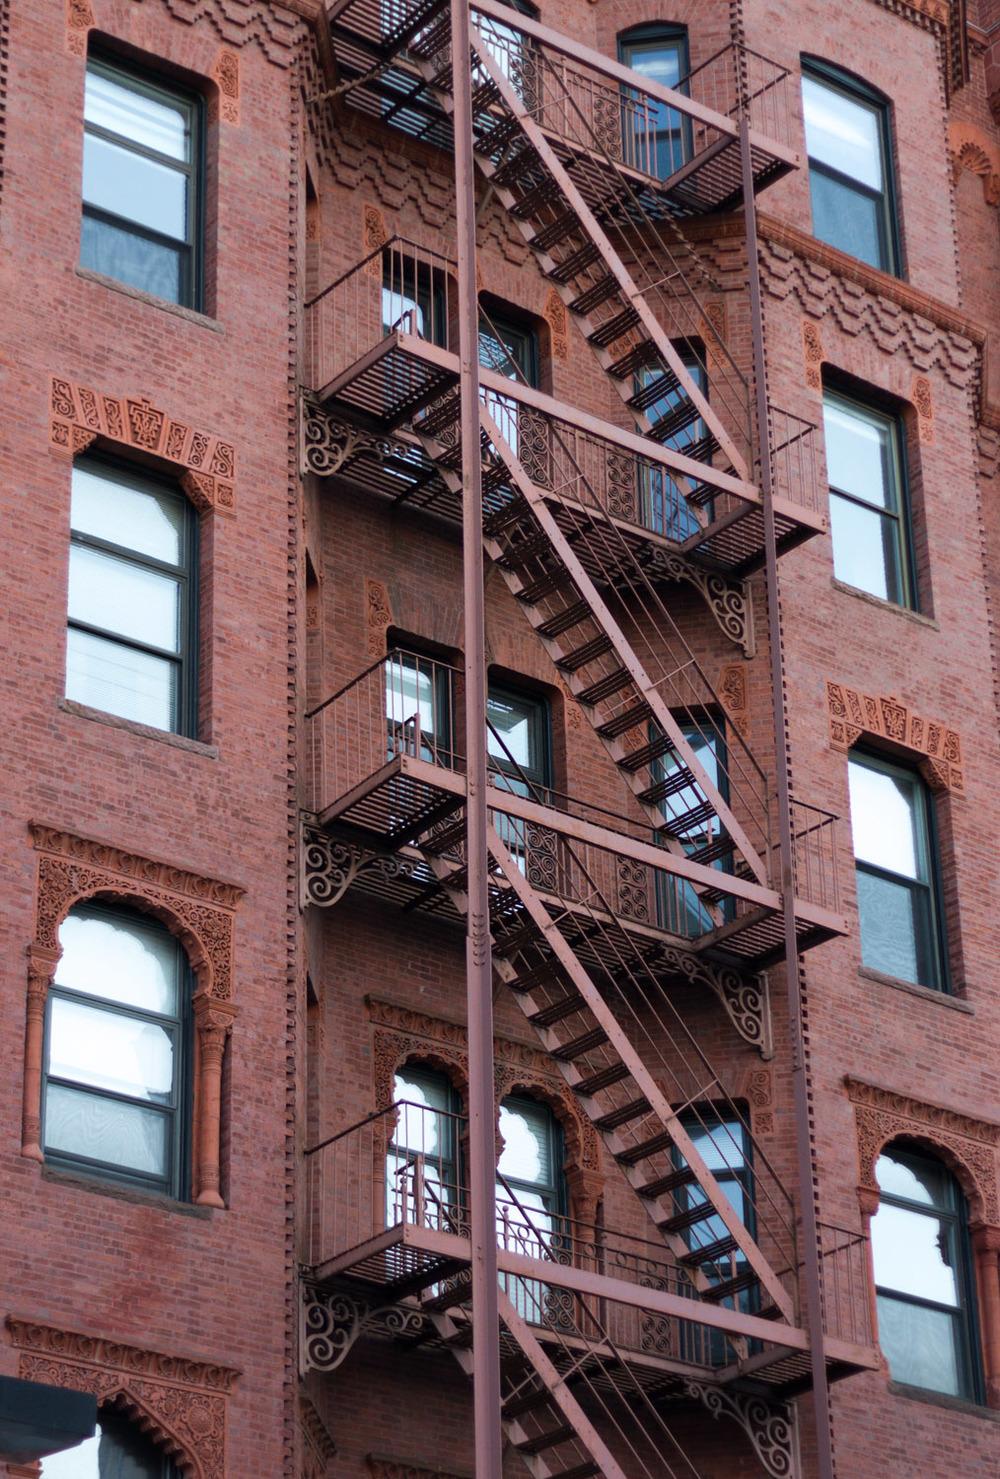 Christian-Schaffer-Massachusetts-Boston-Newbury-Street-004.jpg